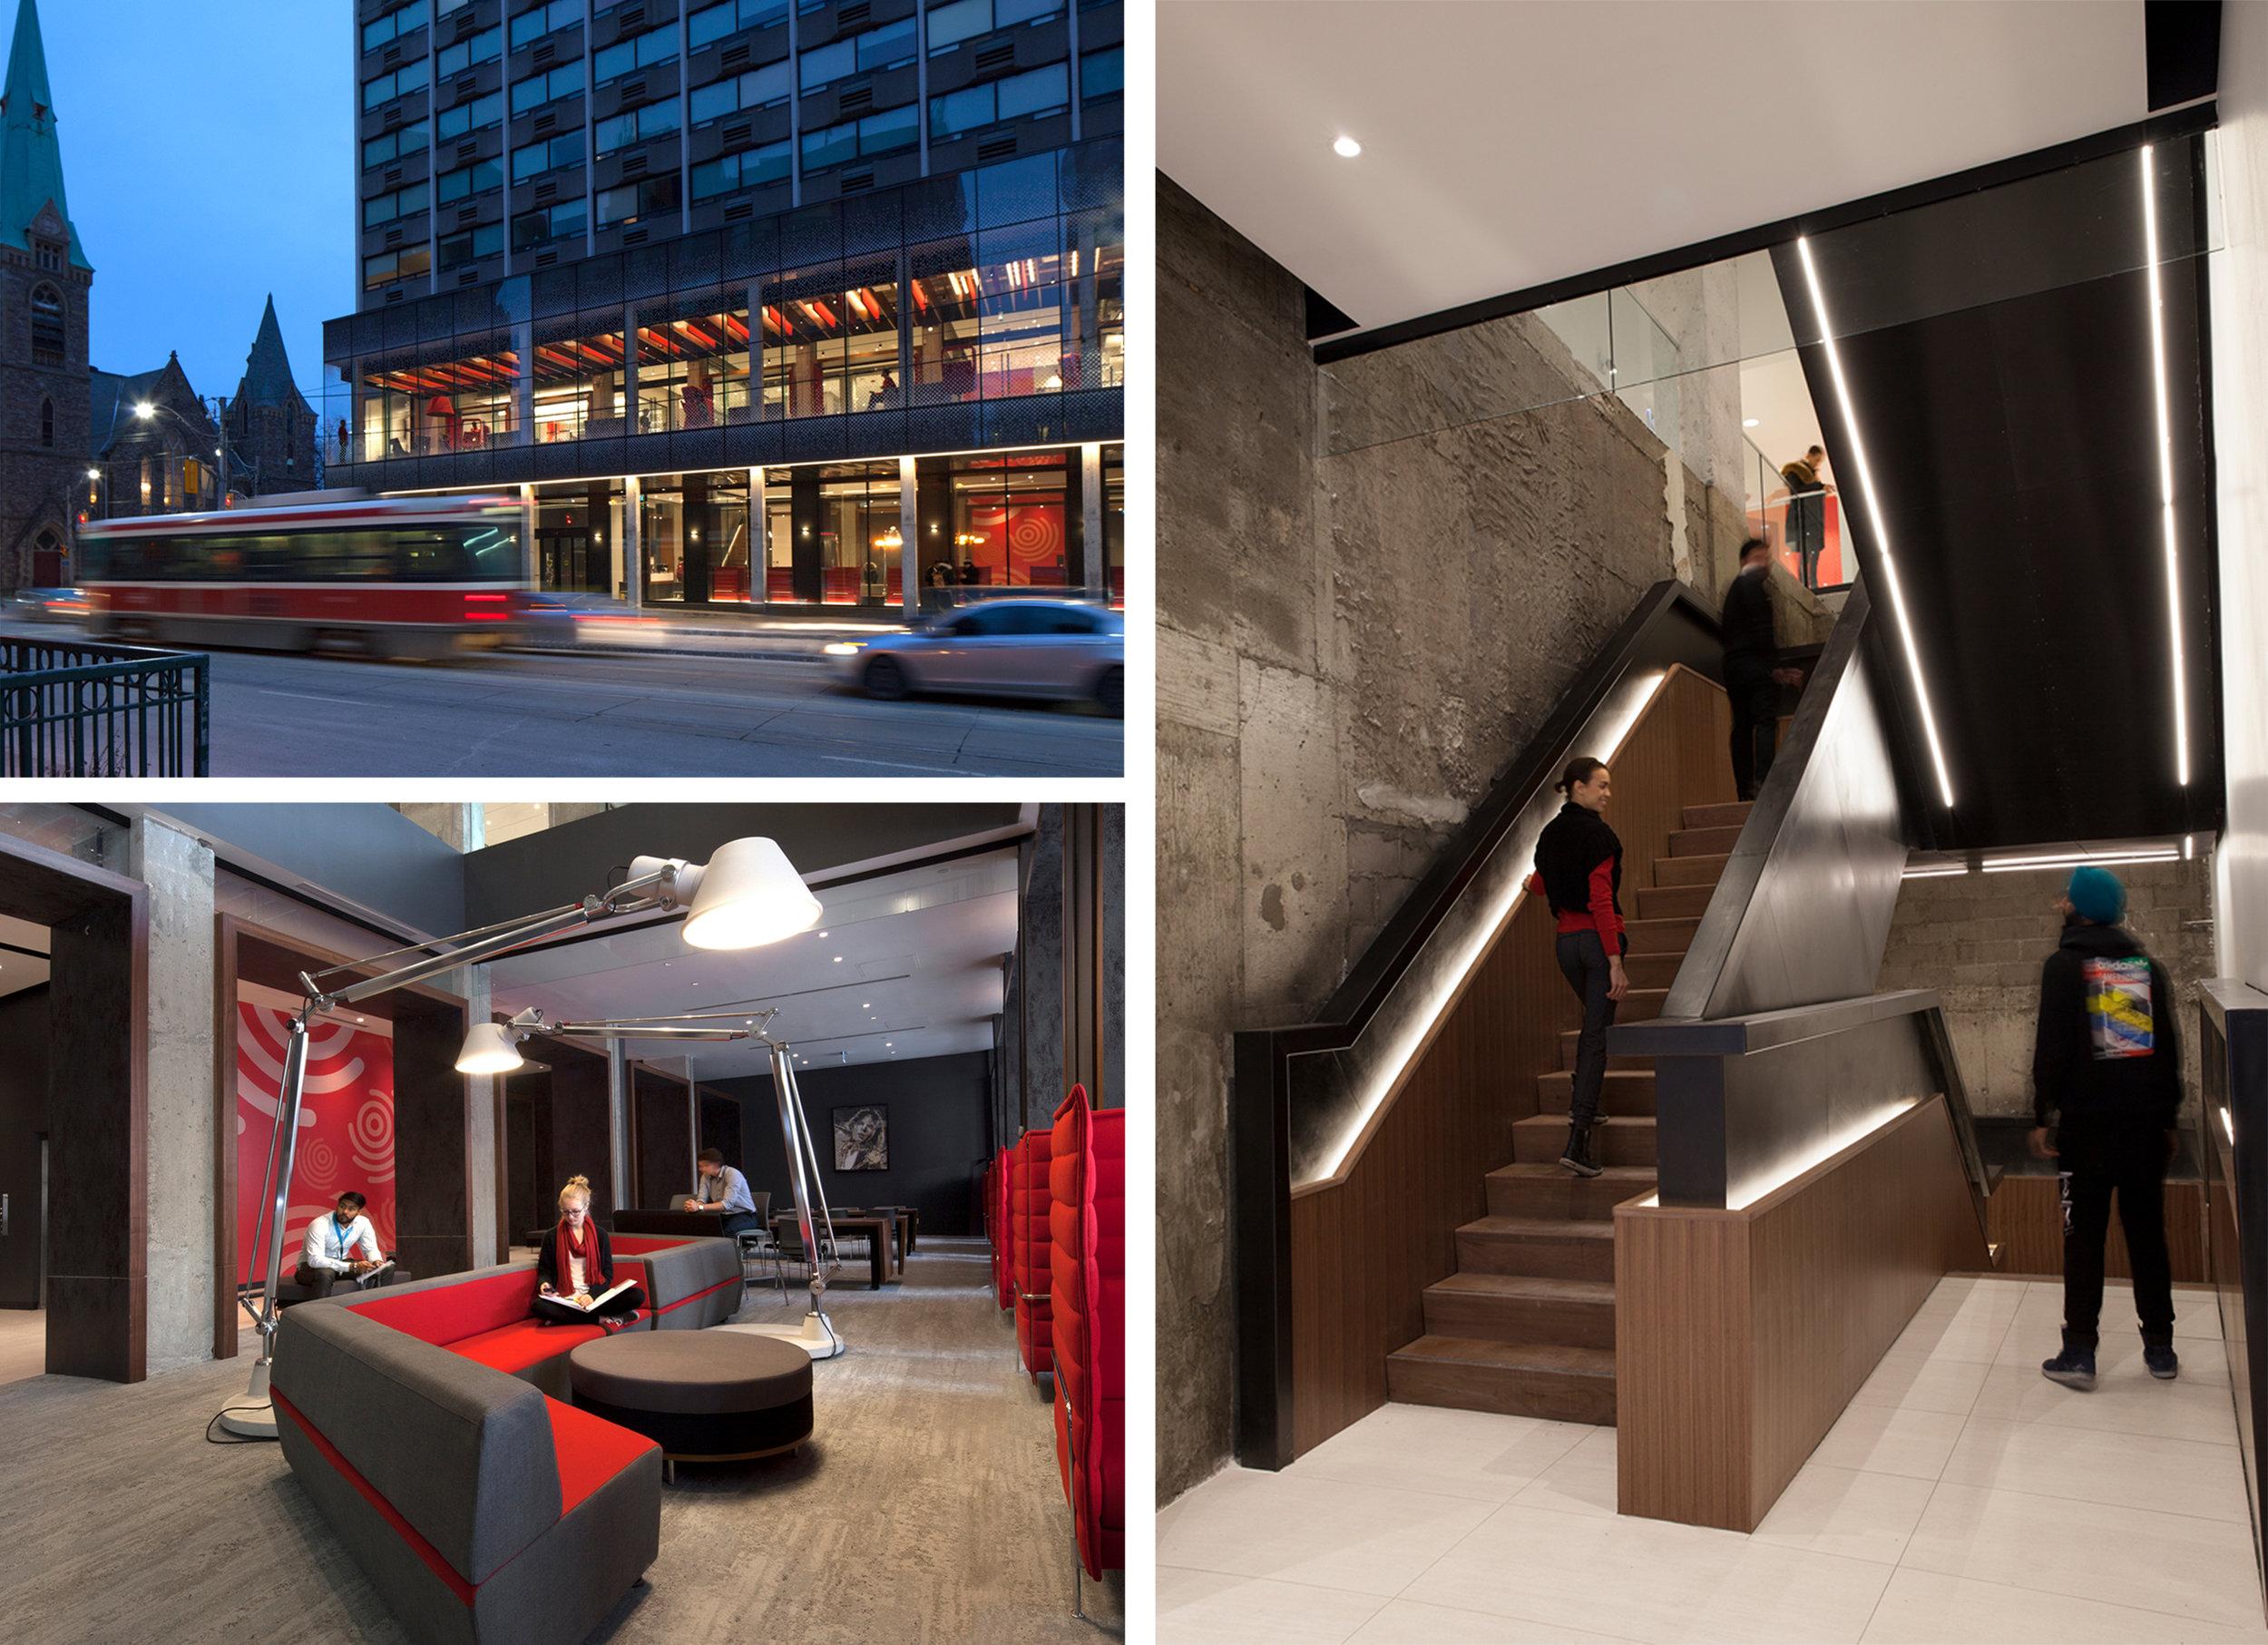 Ies Toronto Interior Lighting Design Award For Parkside